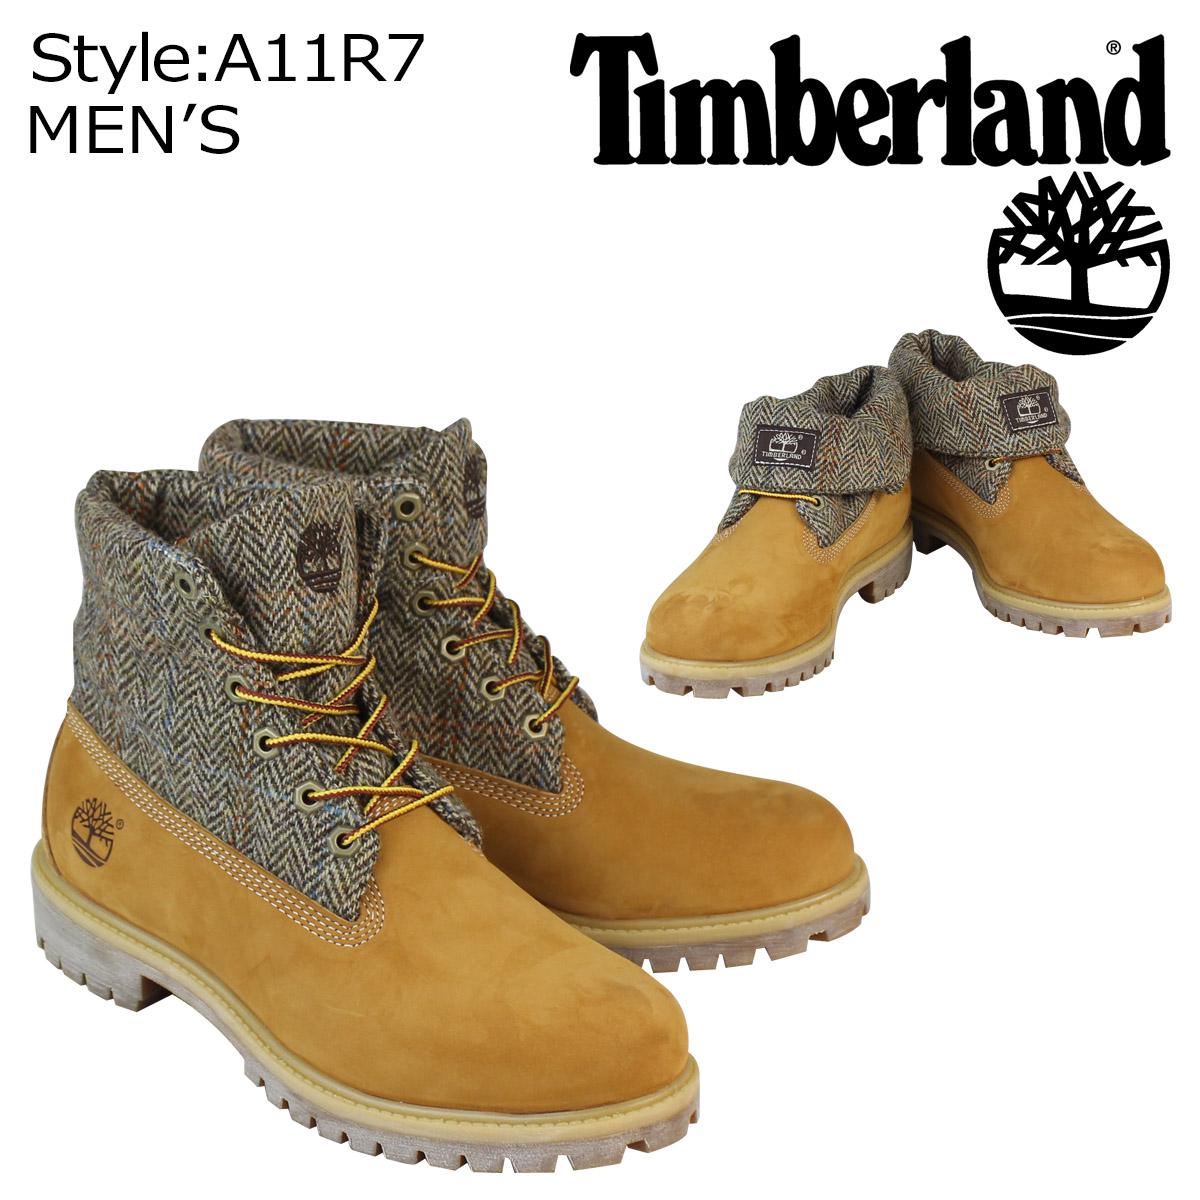 f17186c24083 ALLSPORTS   laquo Pre-order items raquo   laquo 12   11 around stock raquo  Timberland  Timberland men s ICON ROLL-TOP HARRIS TWEED FABRIC boots icon rolltop ...